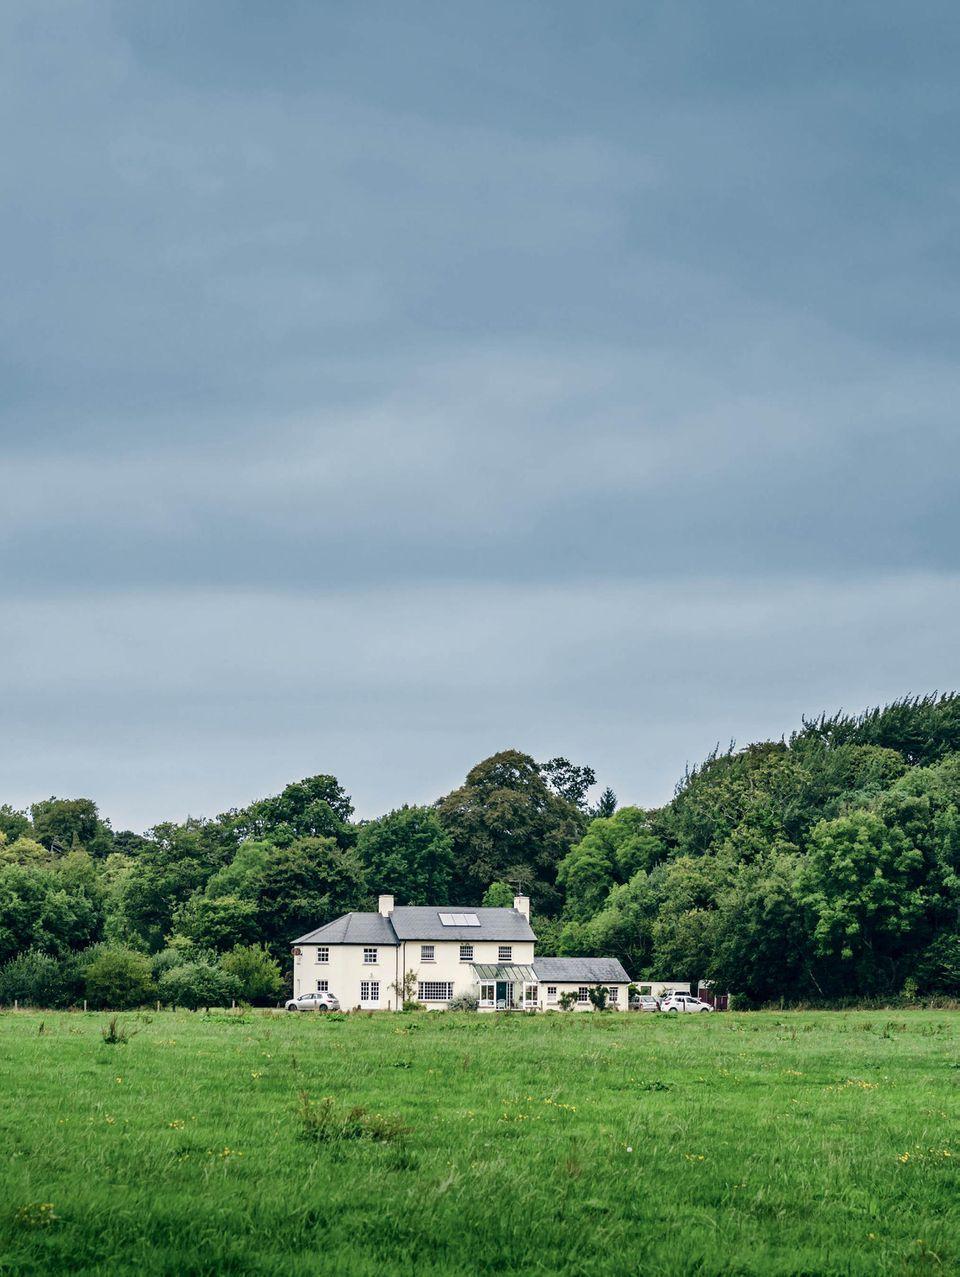 Housesitting: Haus auf dem Land